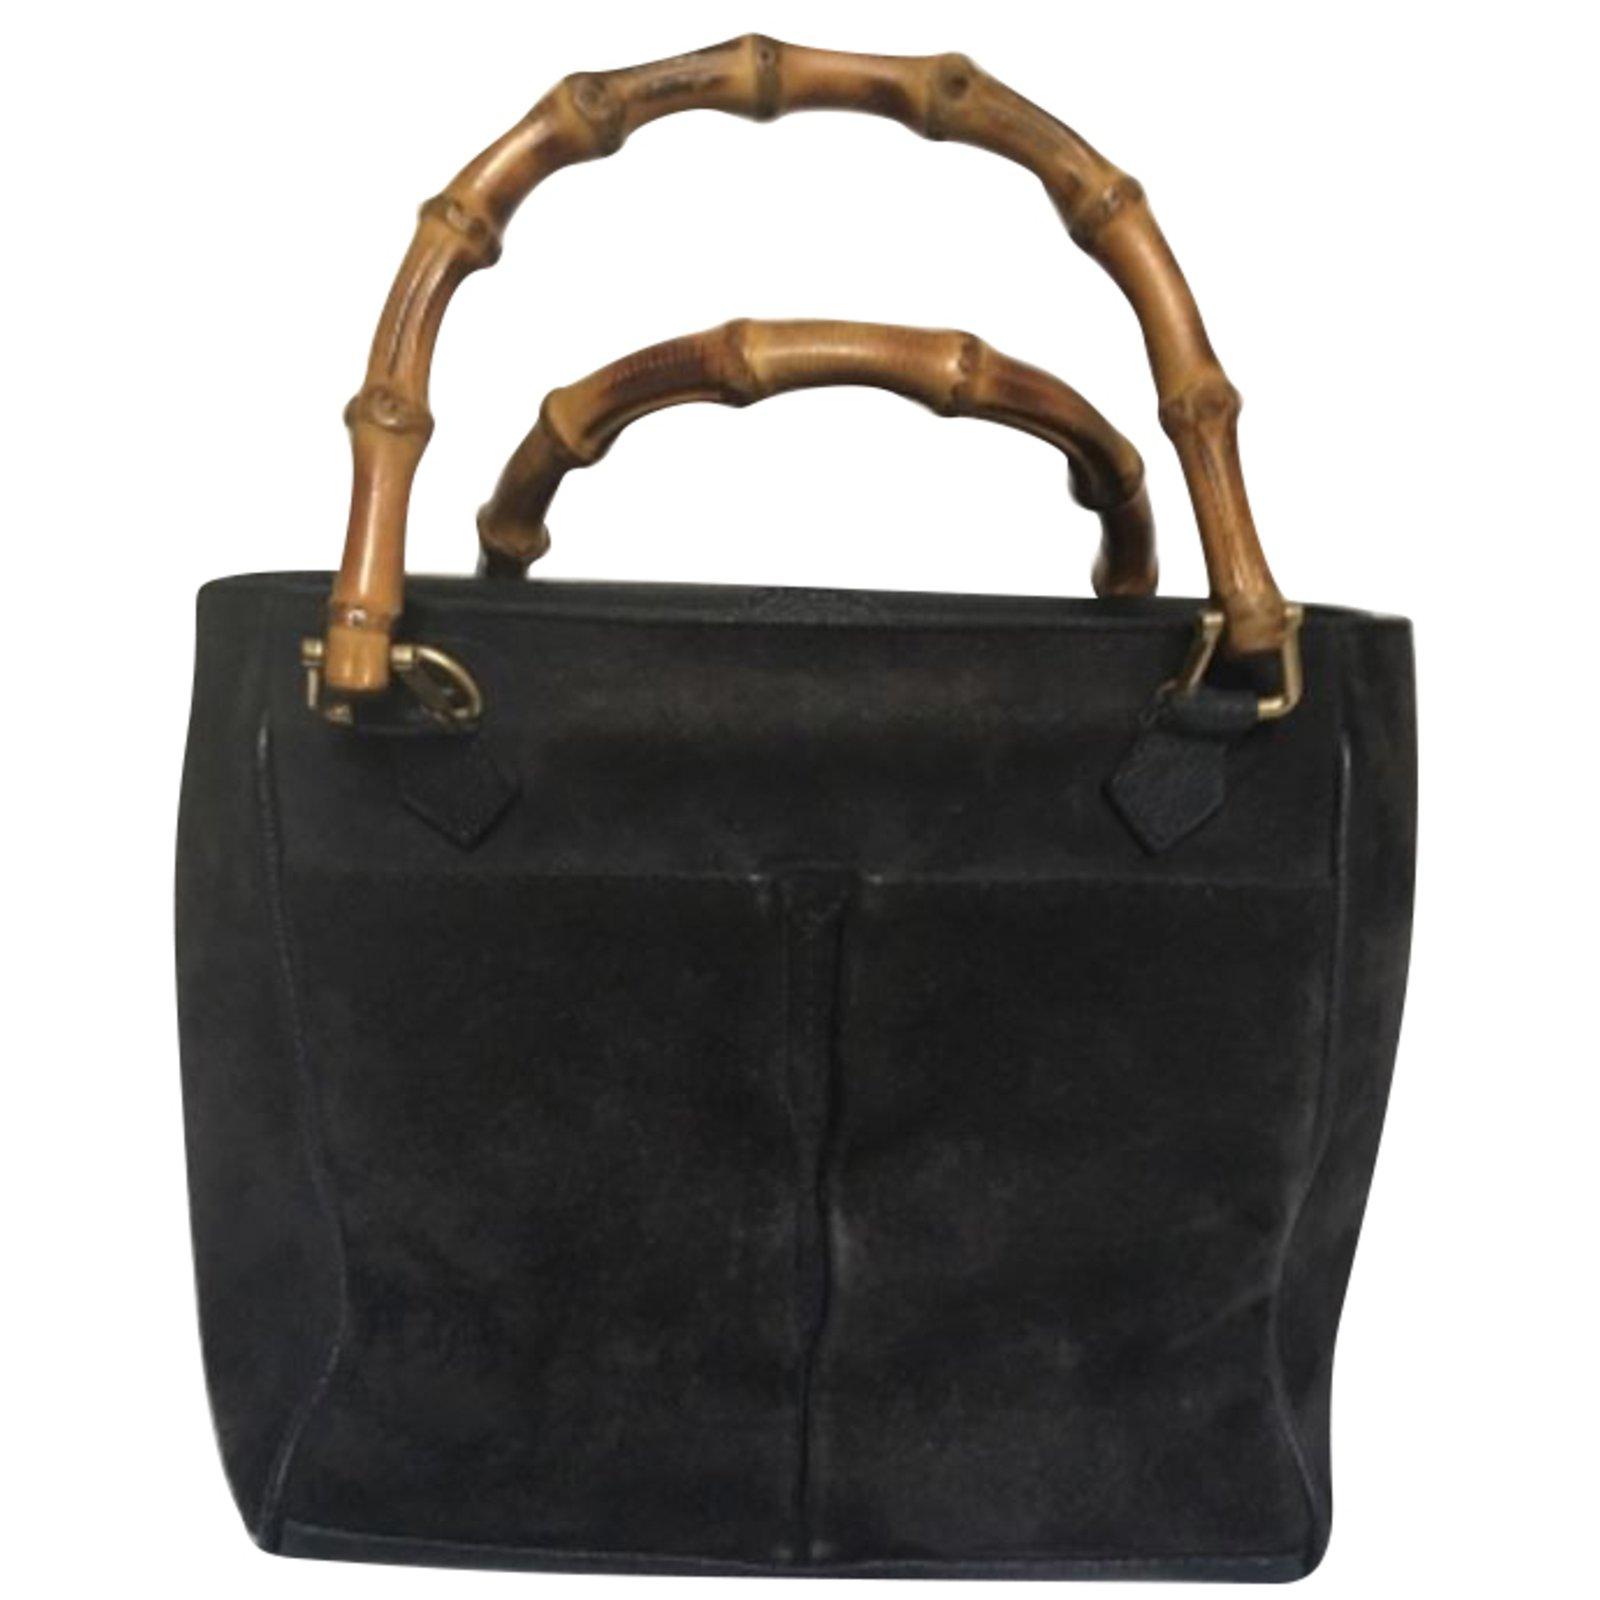 7d98c21535d7b Gucci Bamboo Handbag Handbags Deerskin Blue Ref 67121 Joli Closet.  Kaitorikohi take gucci bamboo per mini black calf leather ...